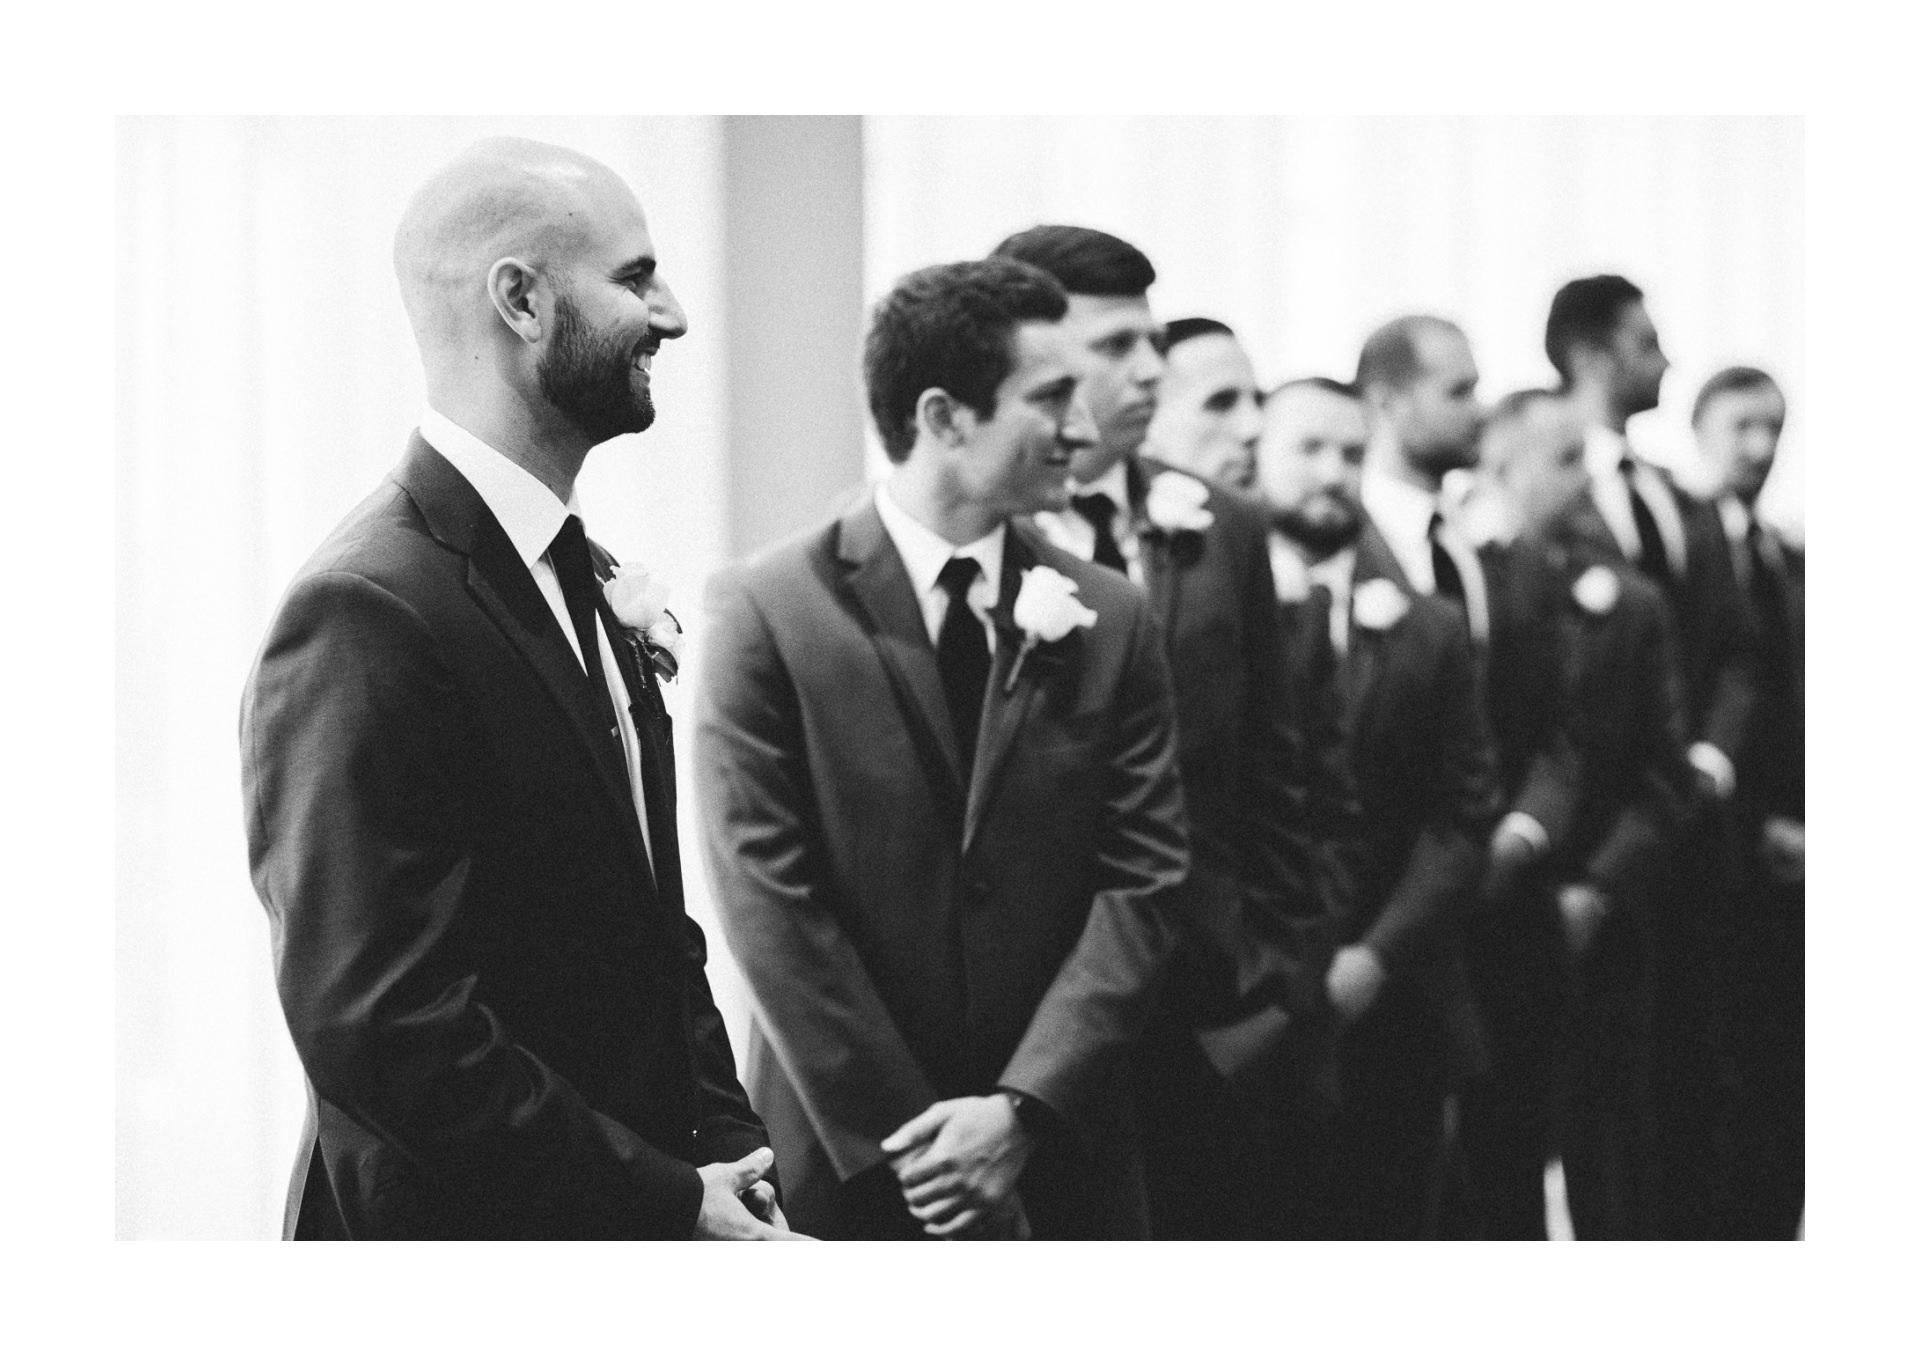 Dowtown Hilton Cleveland Wedding Photographer 2 8.jpg